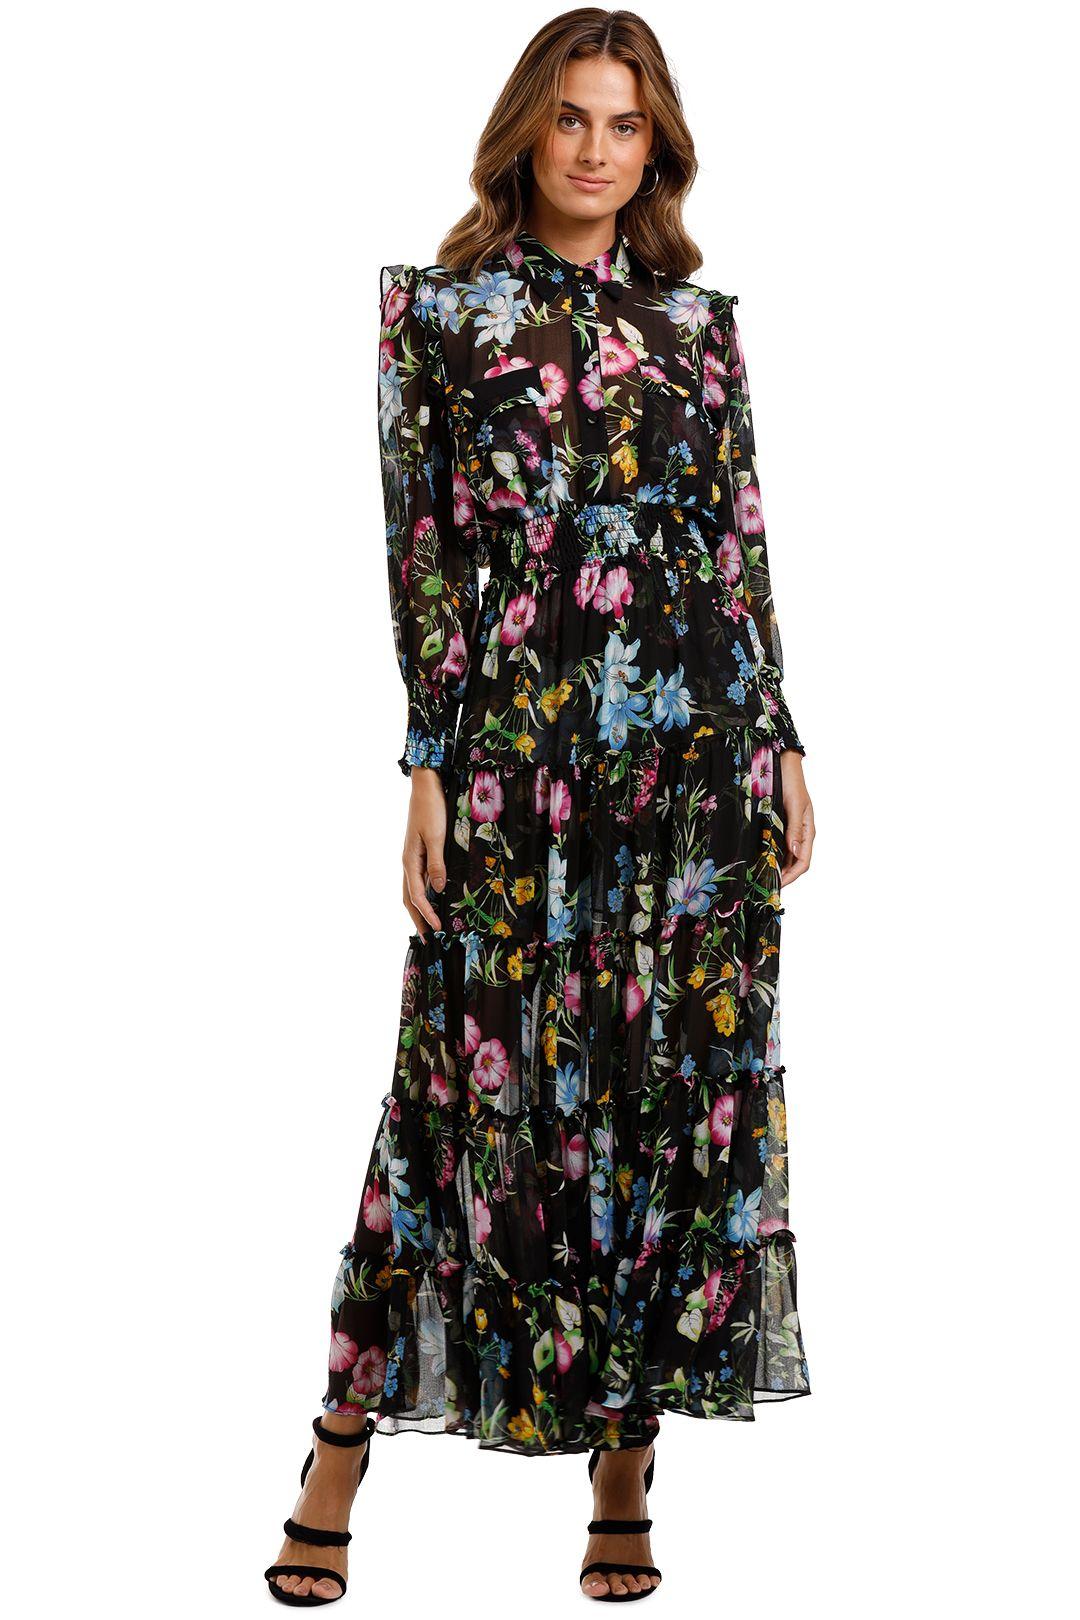 Misa LA Aydeniz Dress dark floral print